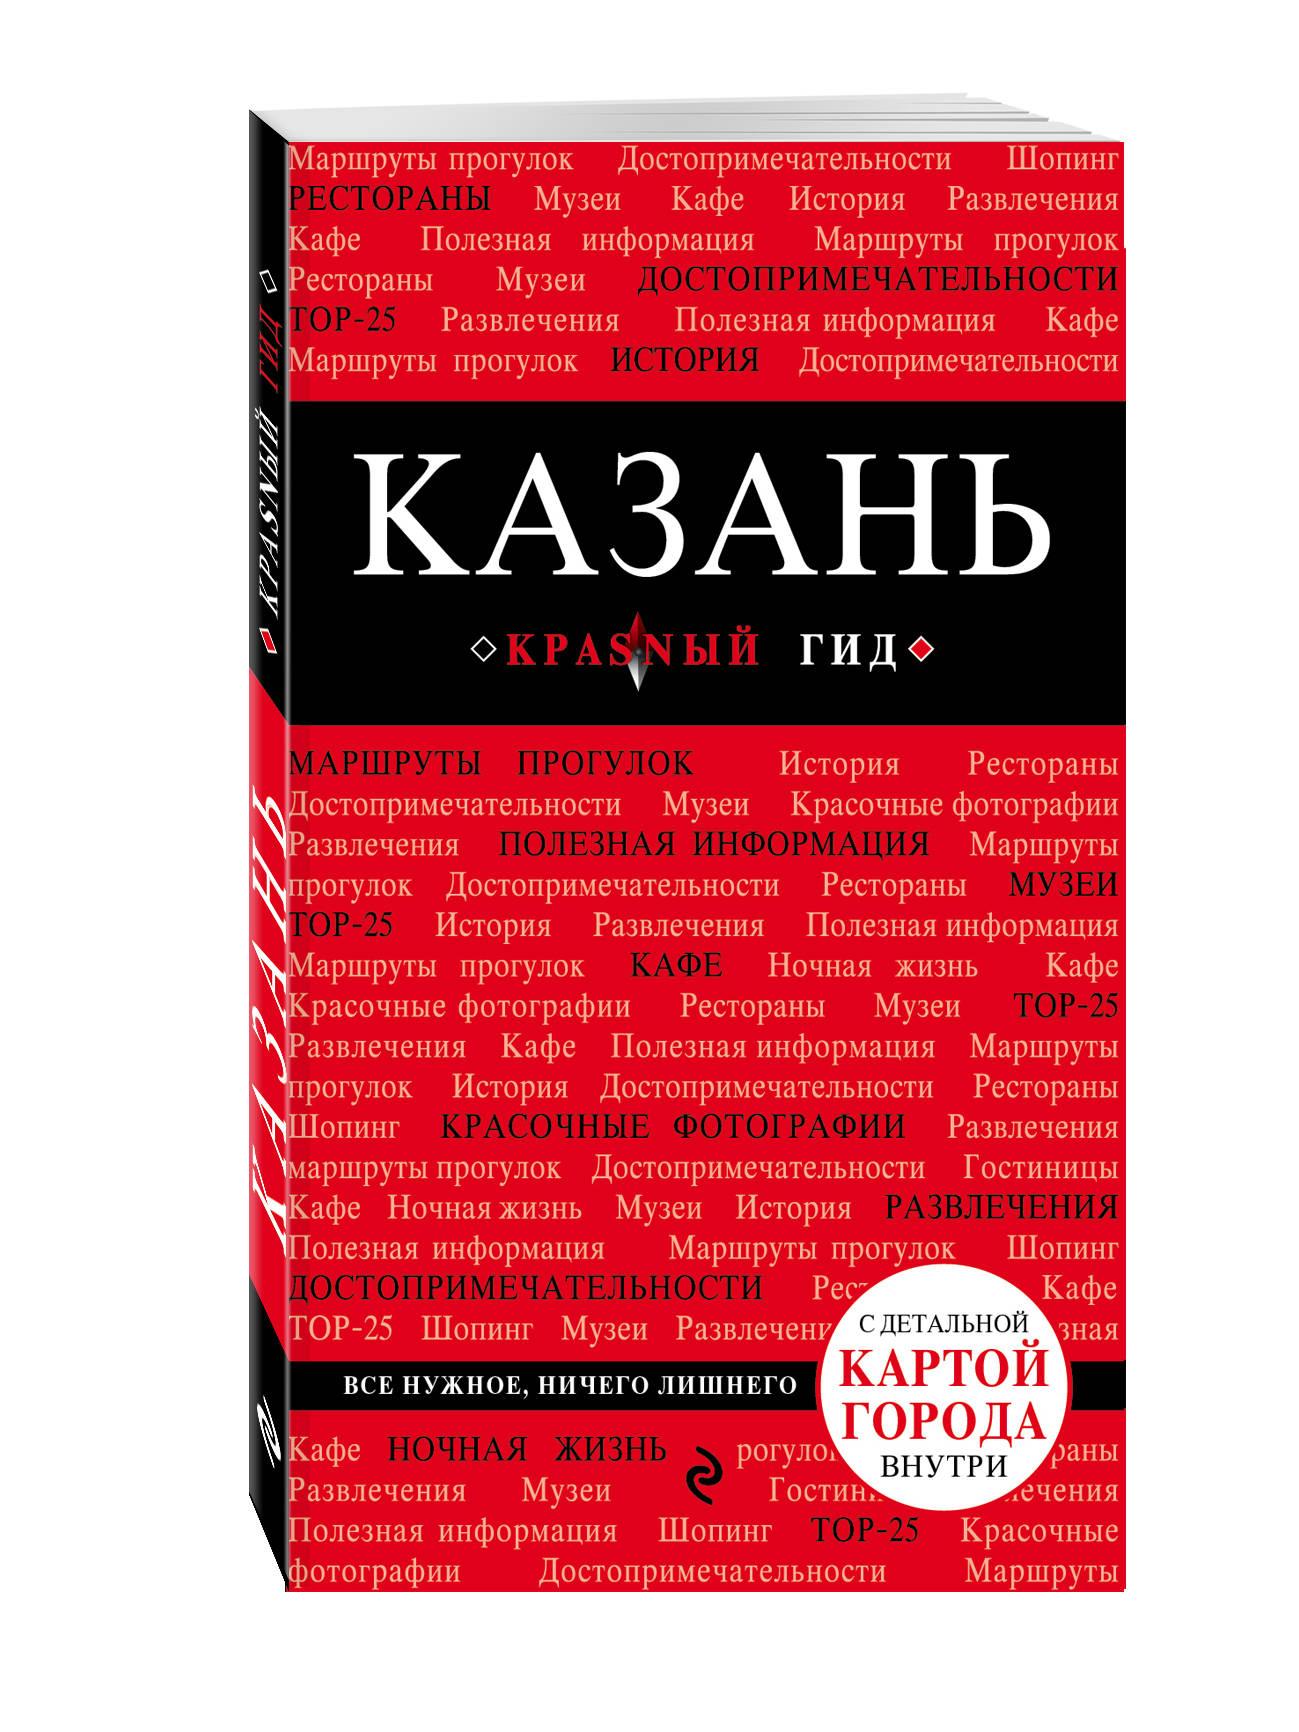 Казань. 2-е изд., испр. и доп. ( Синцов А.Ю.  )